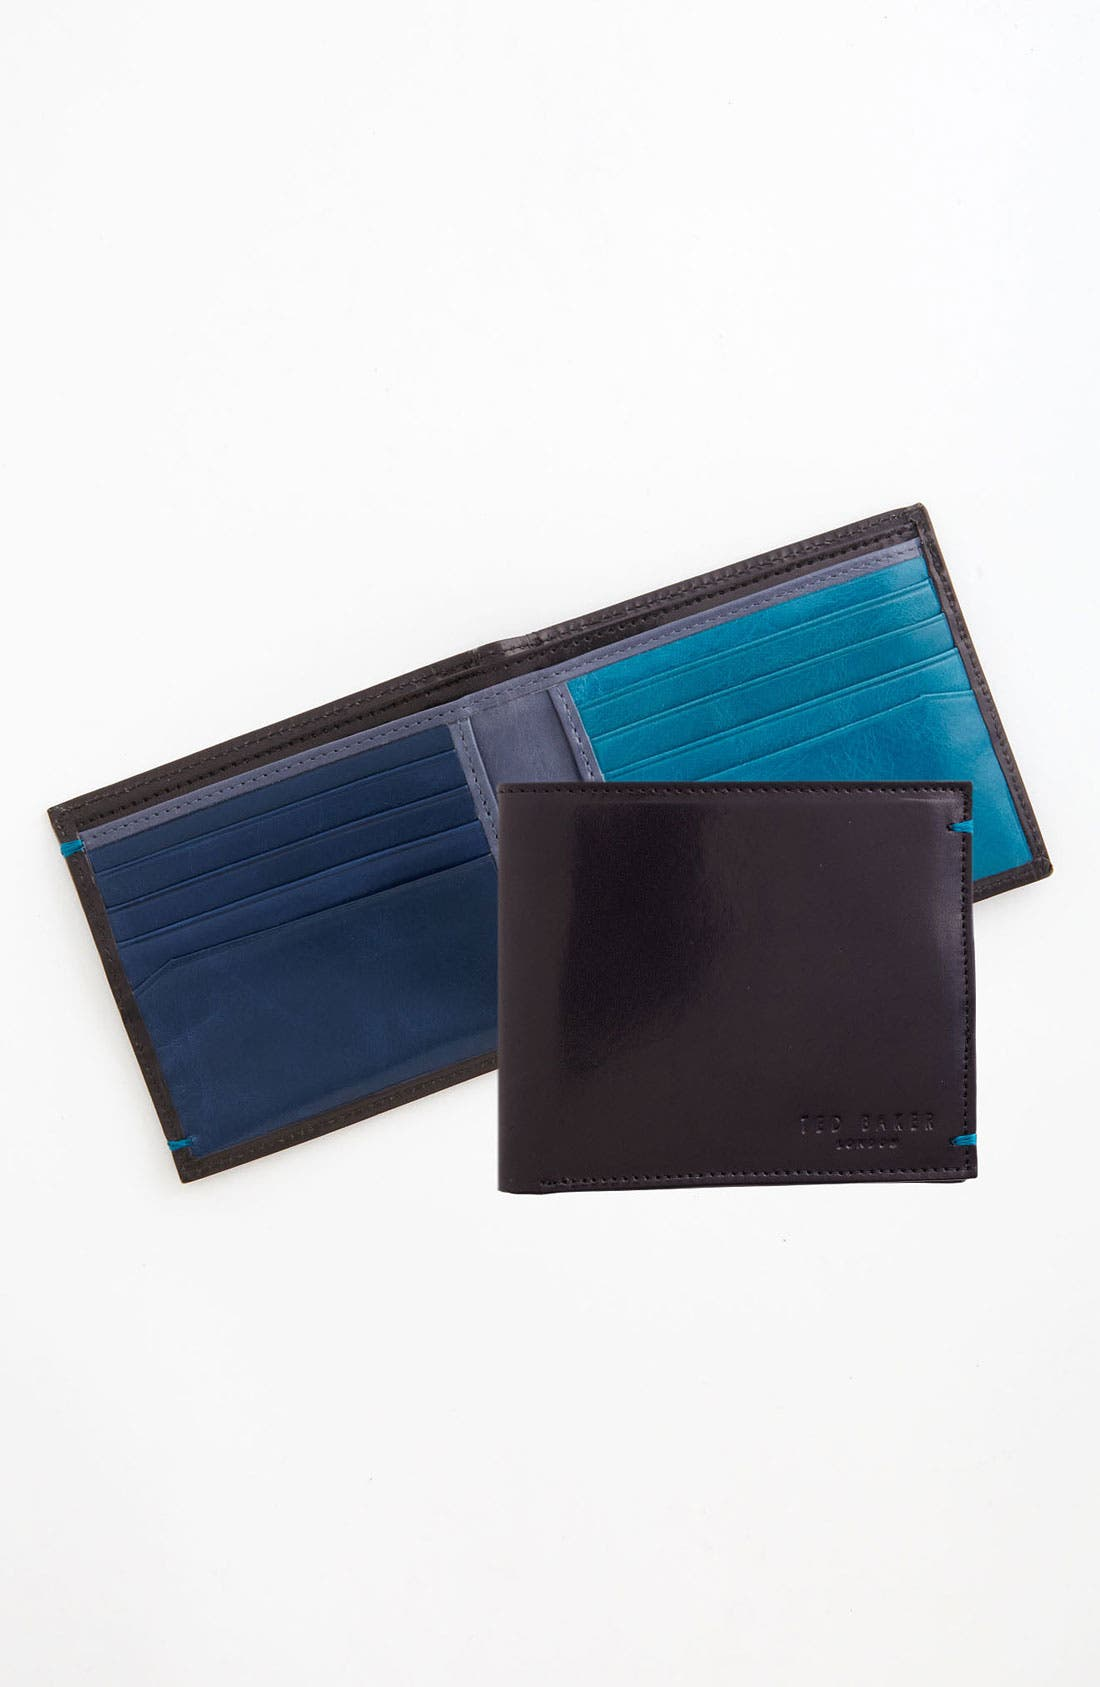 Alternate Image 1 Selected - Ted Baker London 'Bright' Wallet